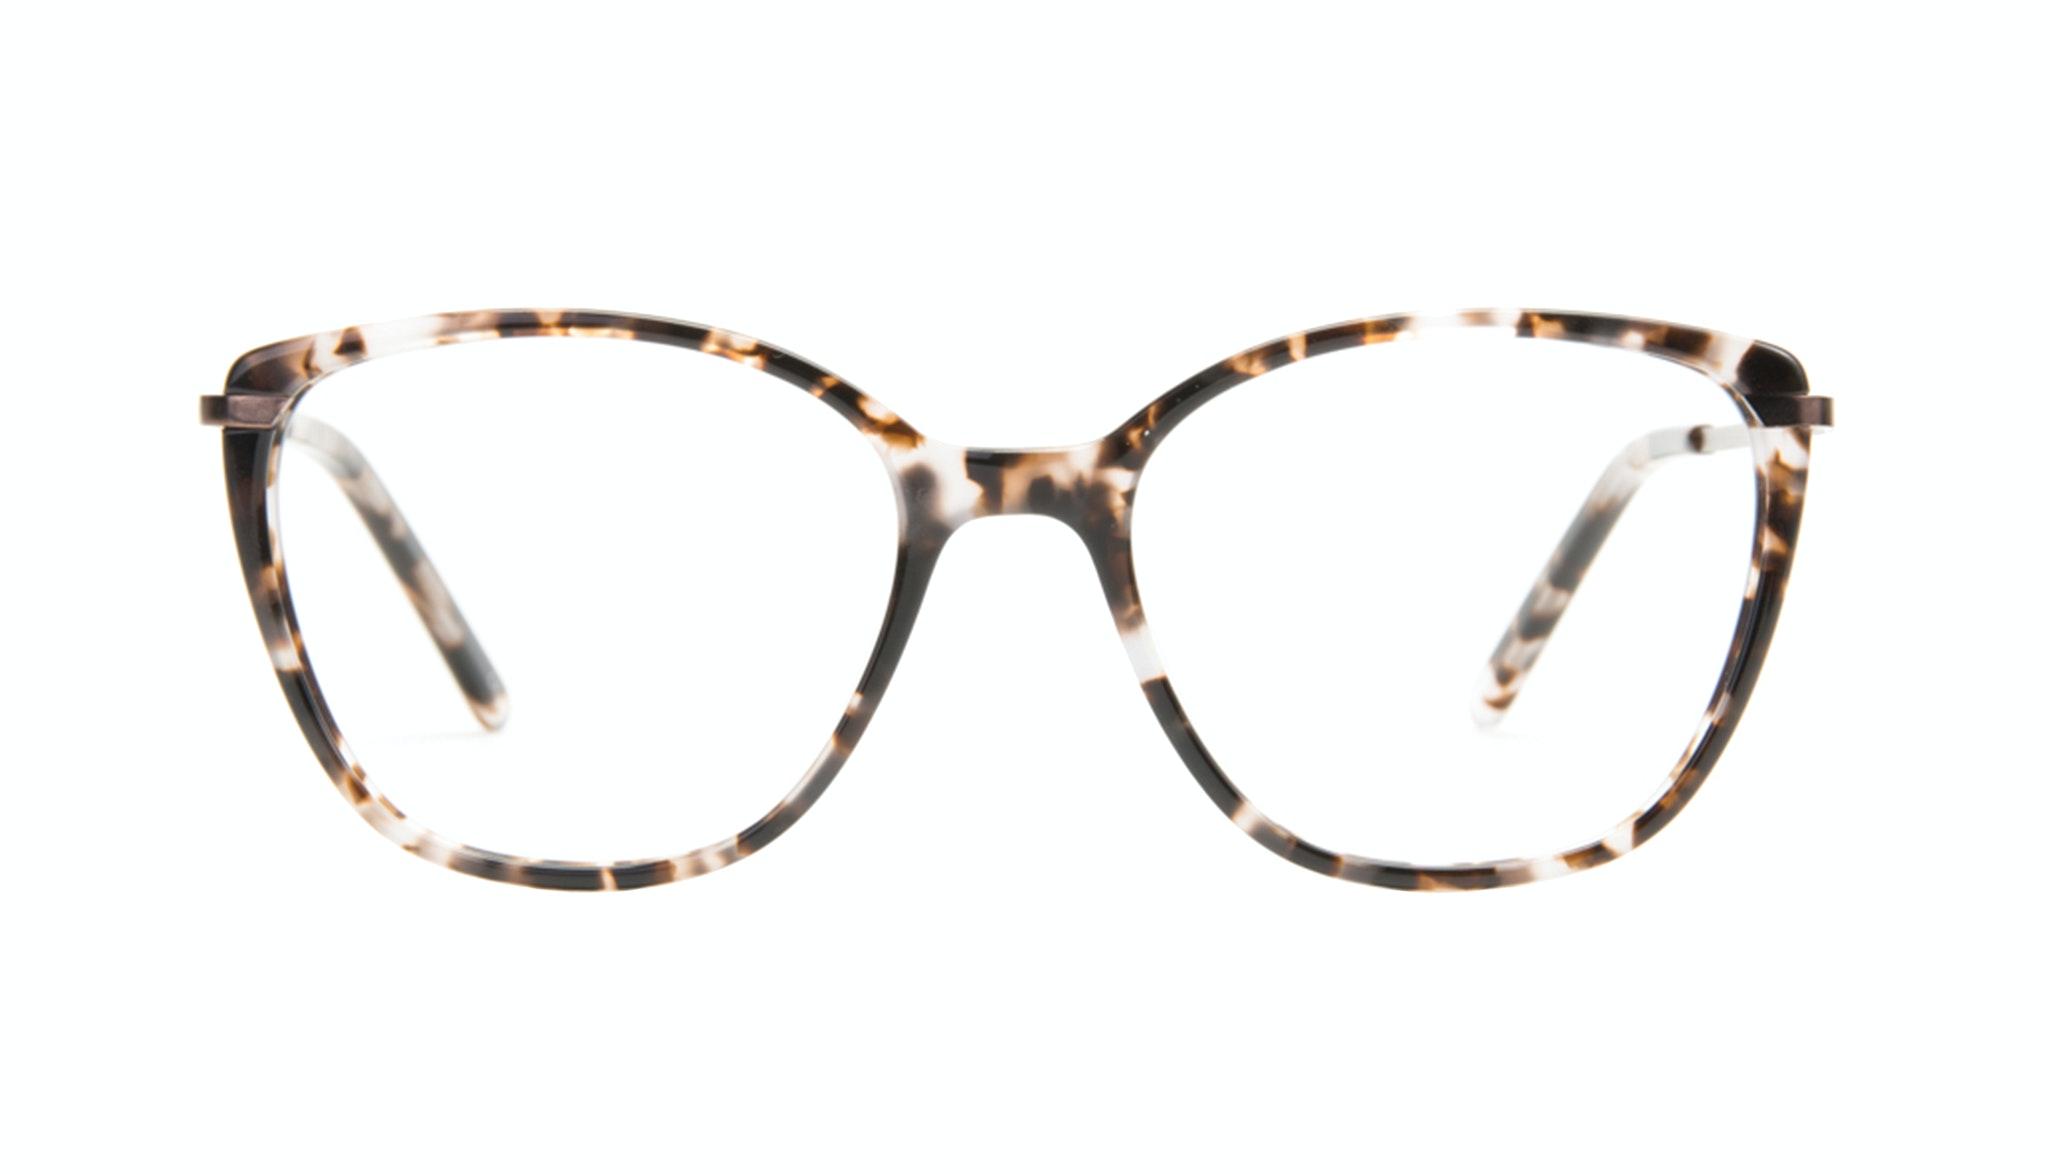 Affordable Fashion Glasses Cat Eye Rectangle Square Eyeglasses Women Illusion Sand